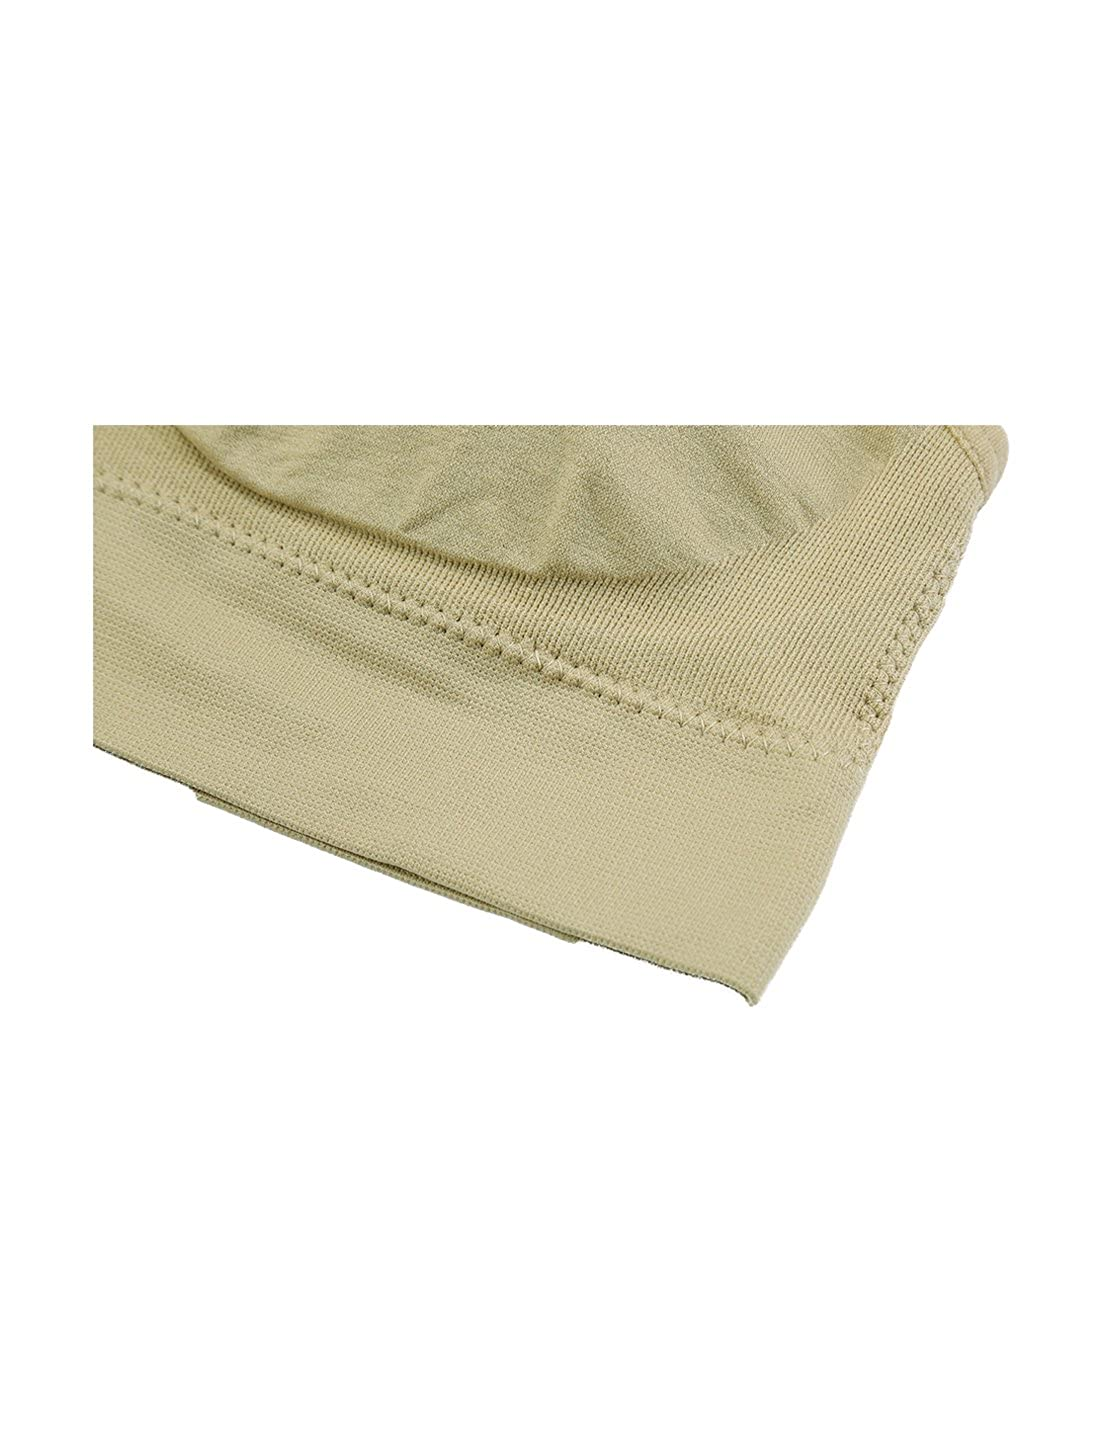 uxcell Women Seamless Middle Impact Pocket Pullover Sport Bra XXL fit 36A//B Black+Beige